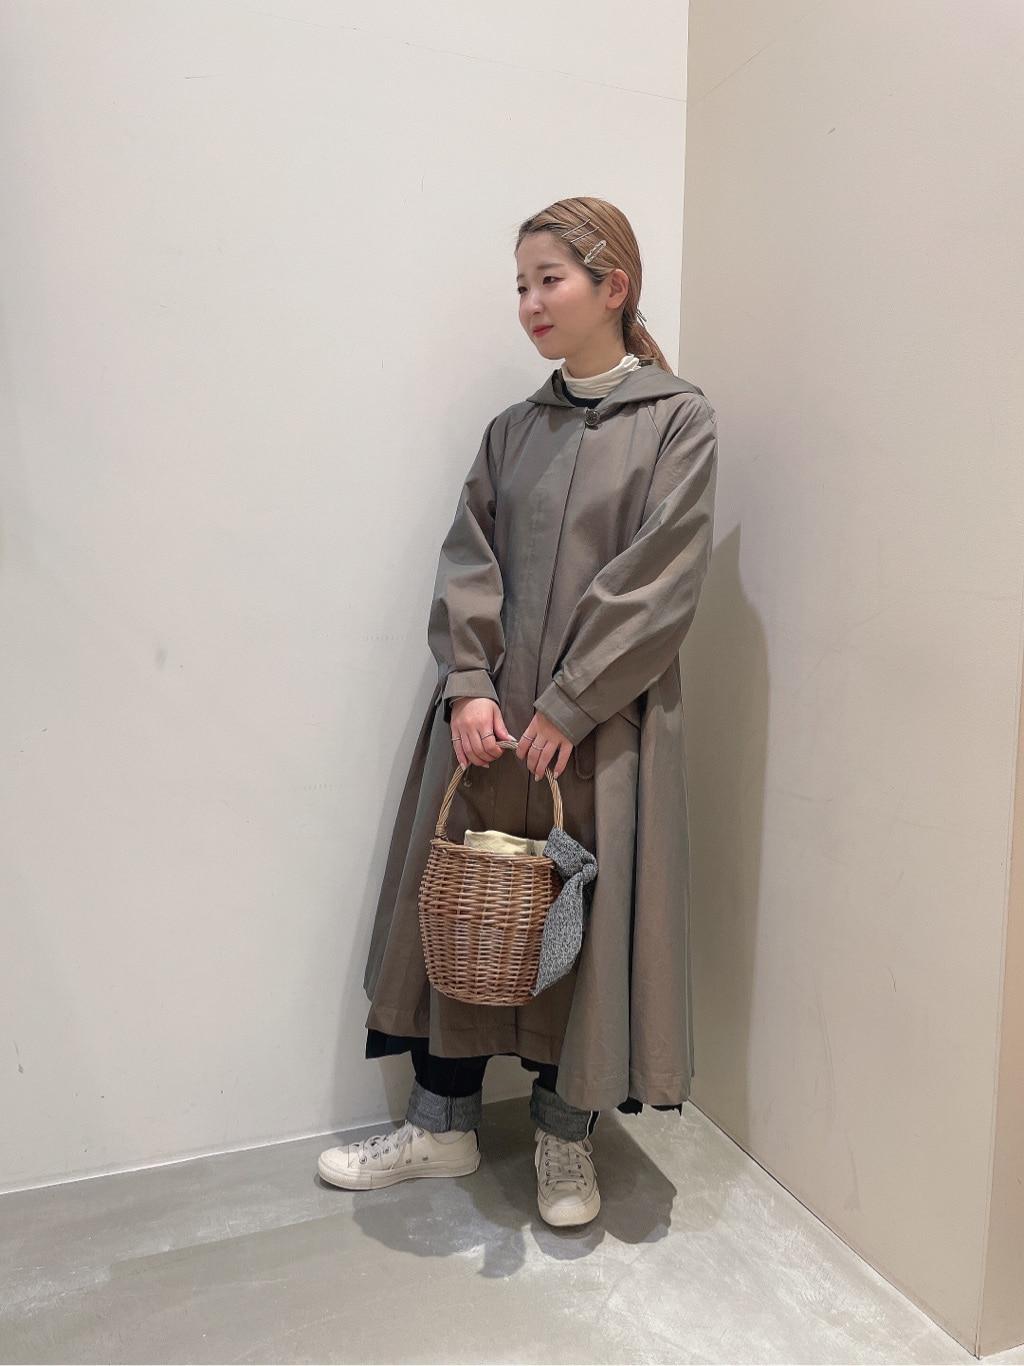 bulle de savon 阪急西宮ガーデンズ 身長:152cm 2021.03.09